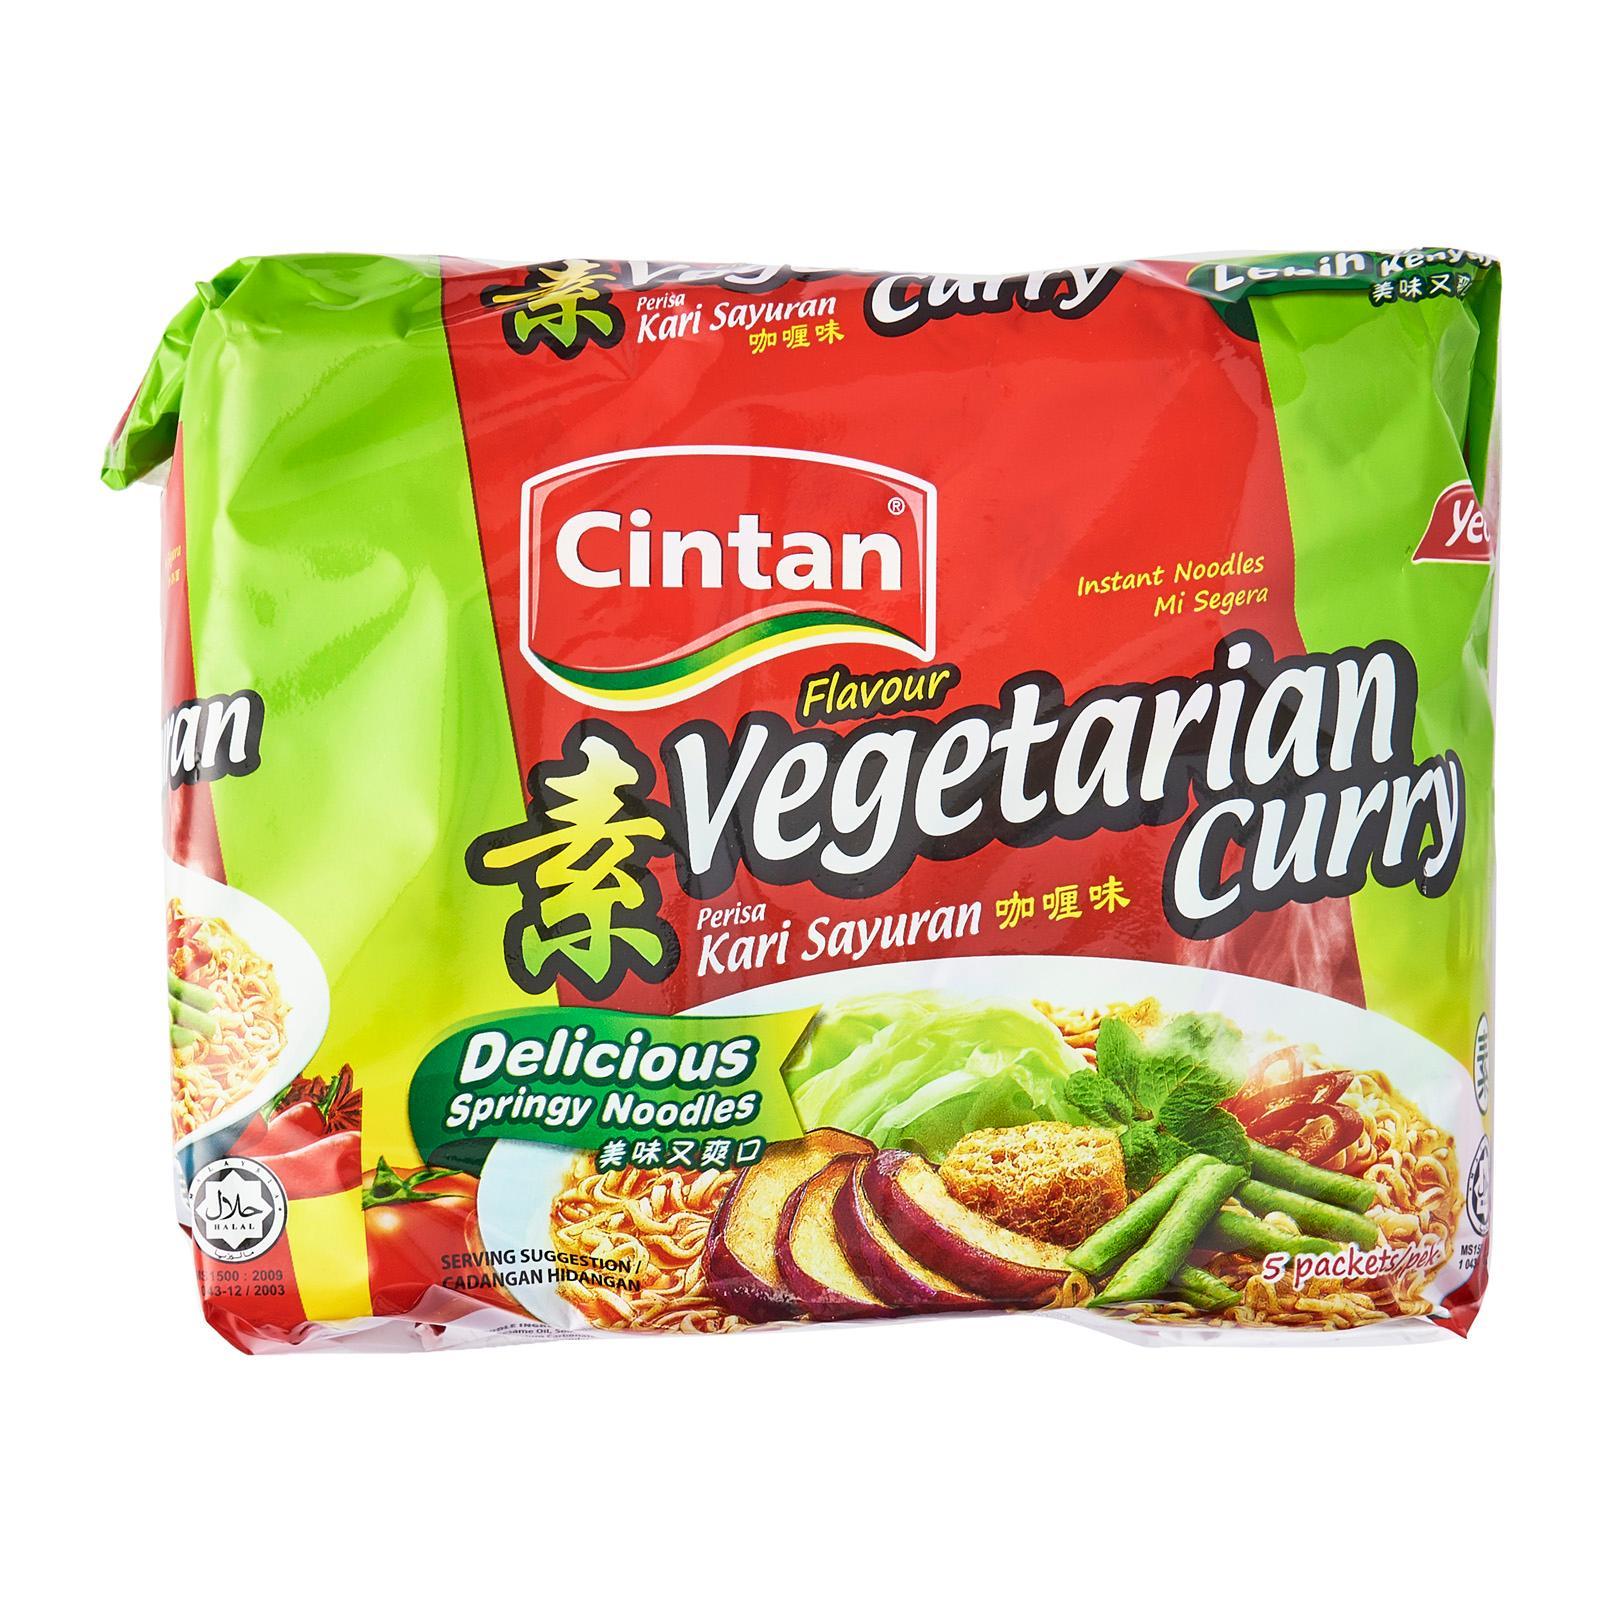 Cintan Noodles Vegetarian Curry